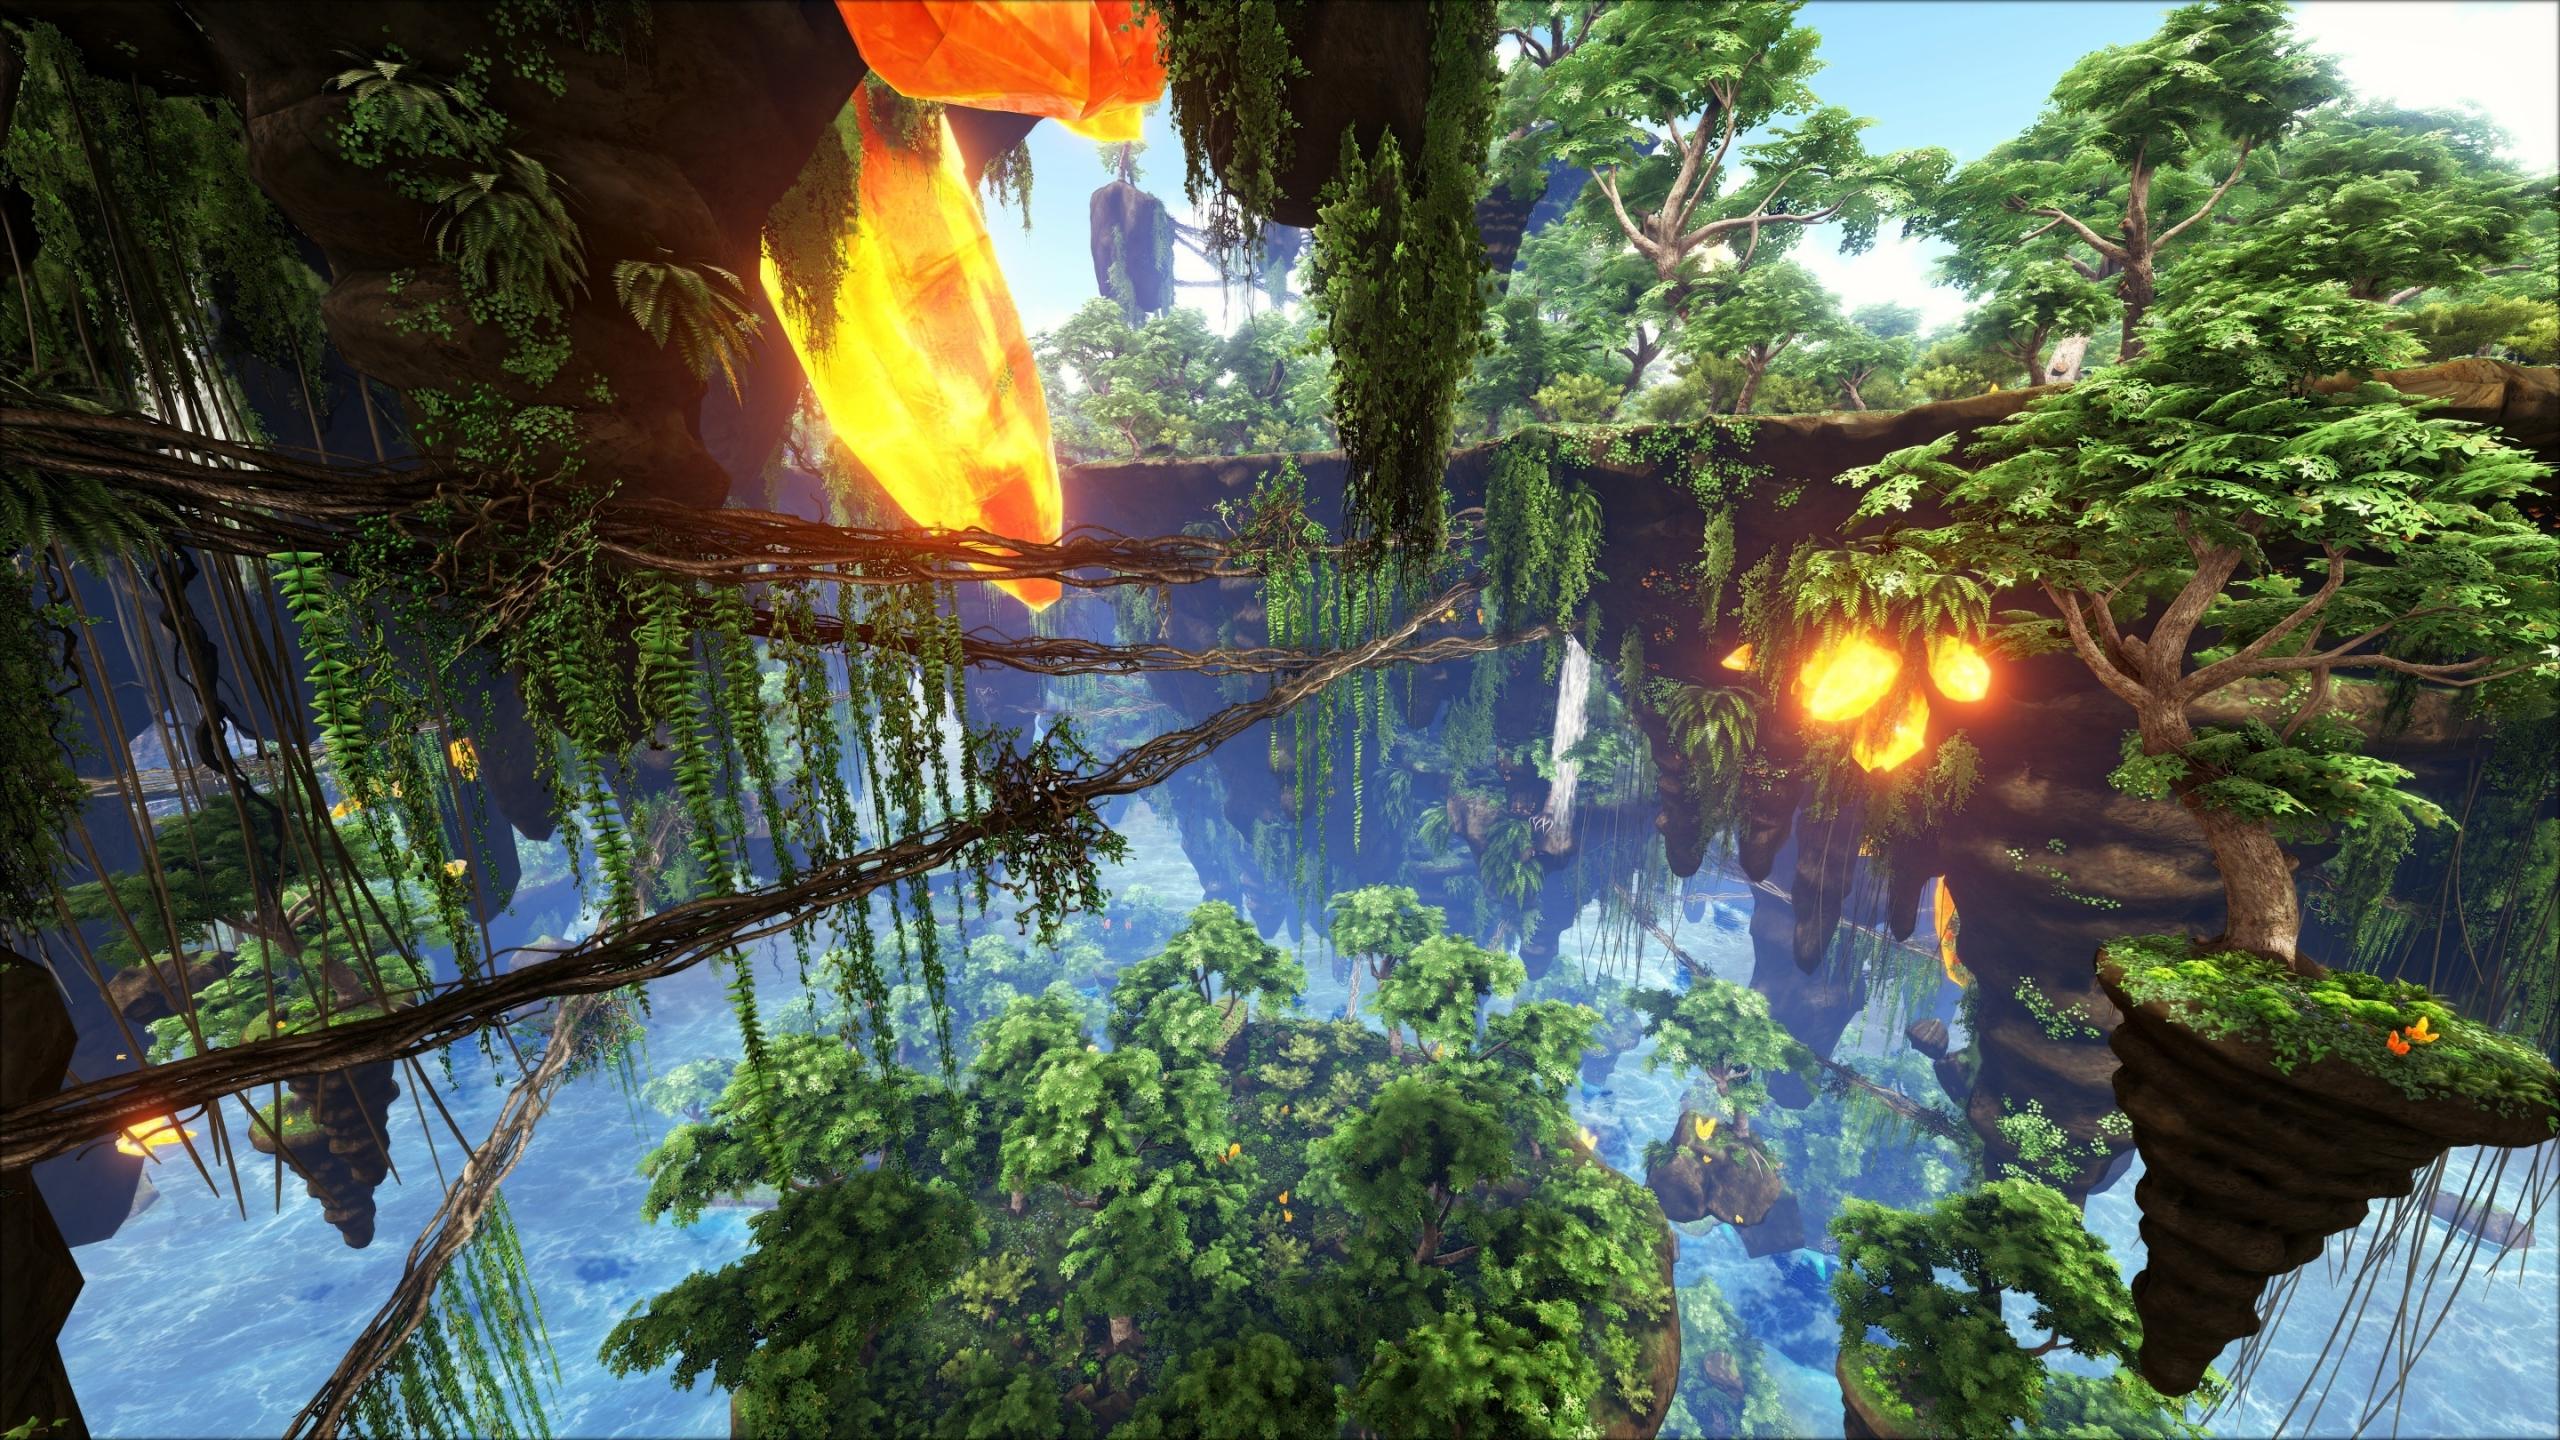 Download 2560x1440 Wallpaper Pandora Nature Ark Survival